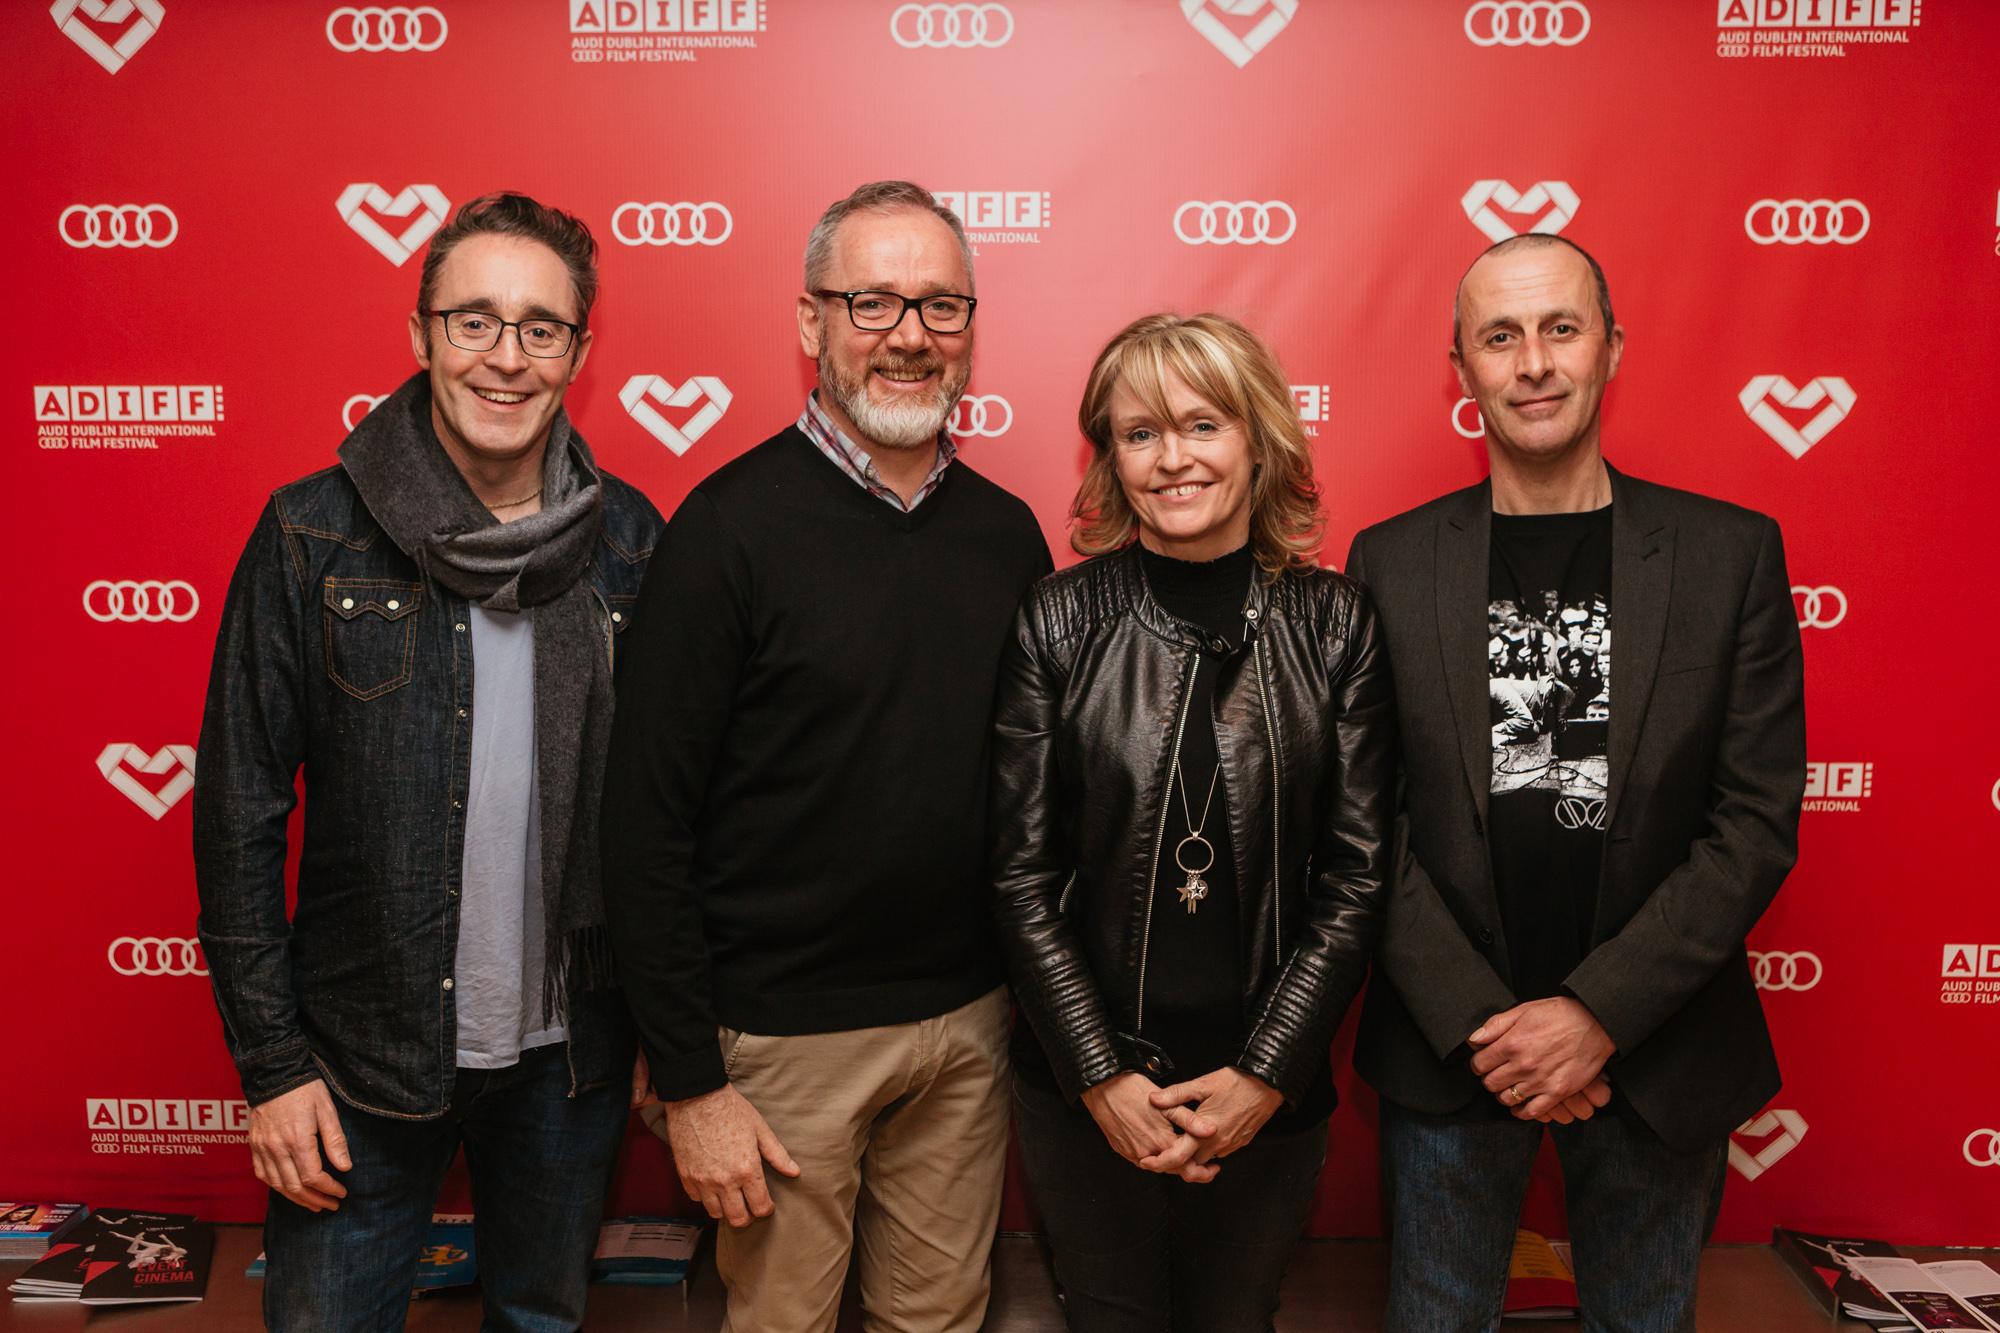 Short Film Award 2018 Jury members Geoff Fitzpatrick and Nick Costello and Discovery Award 2018 Jury members Emer Reynolds and Jason Foran